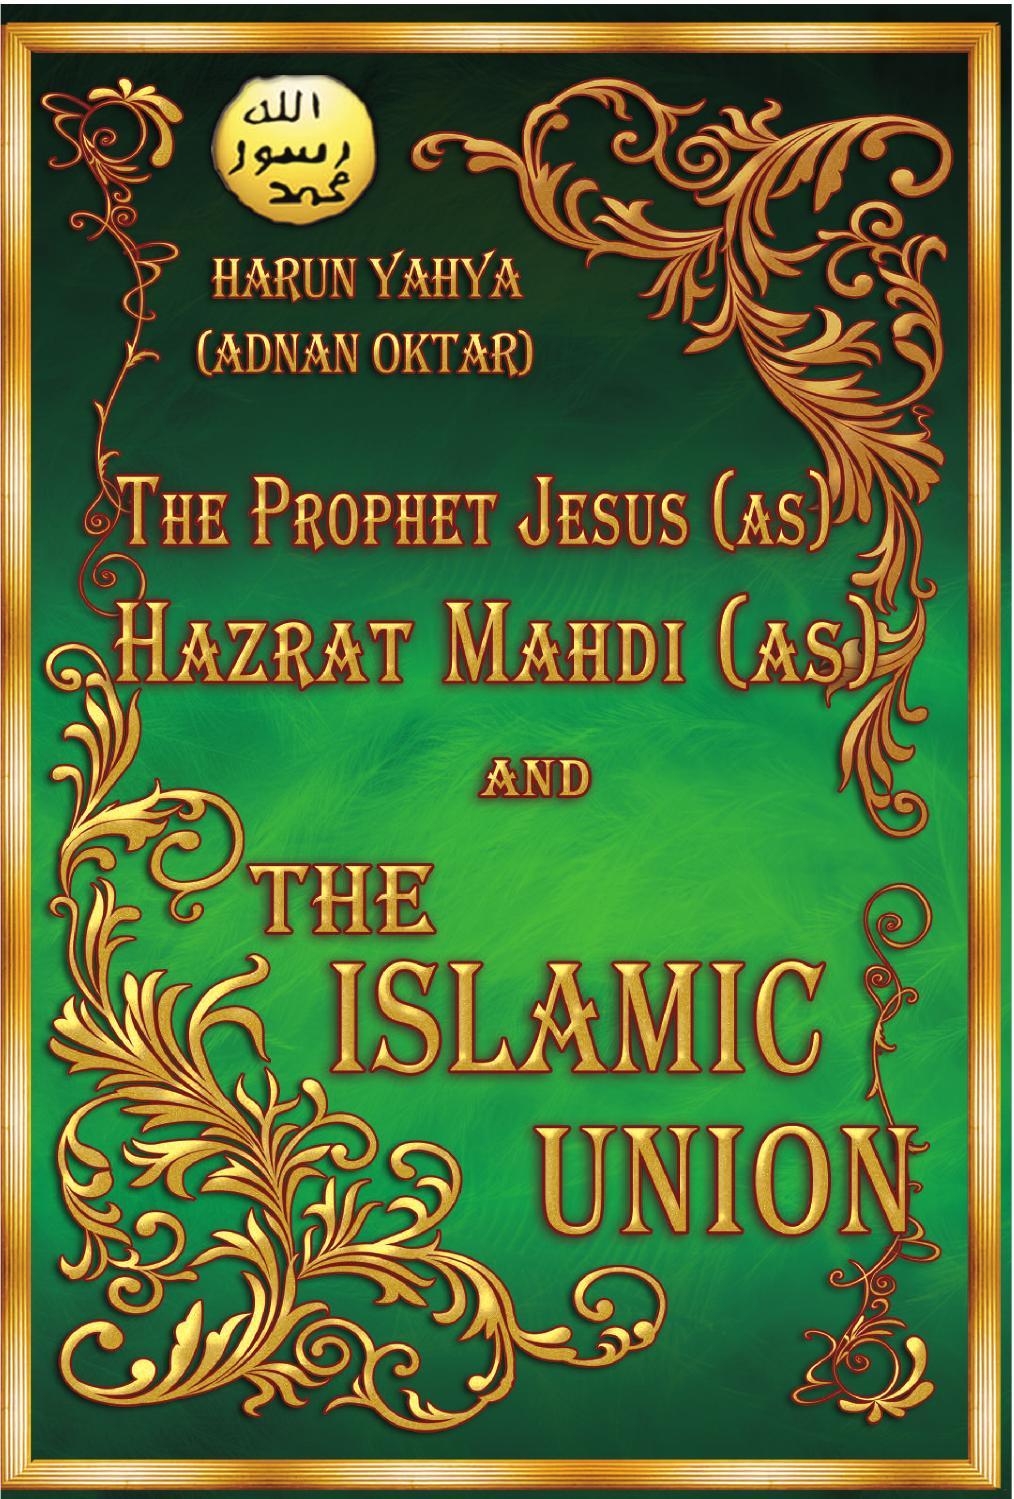 The Prophet Jesus (as) Mahdi (as) Islamic Union by Harun Yəhya